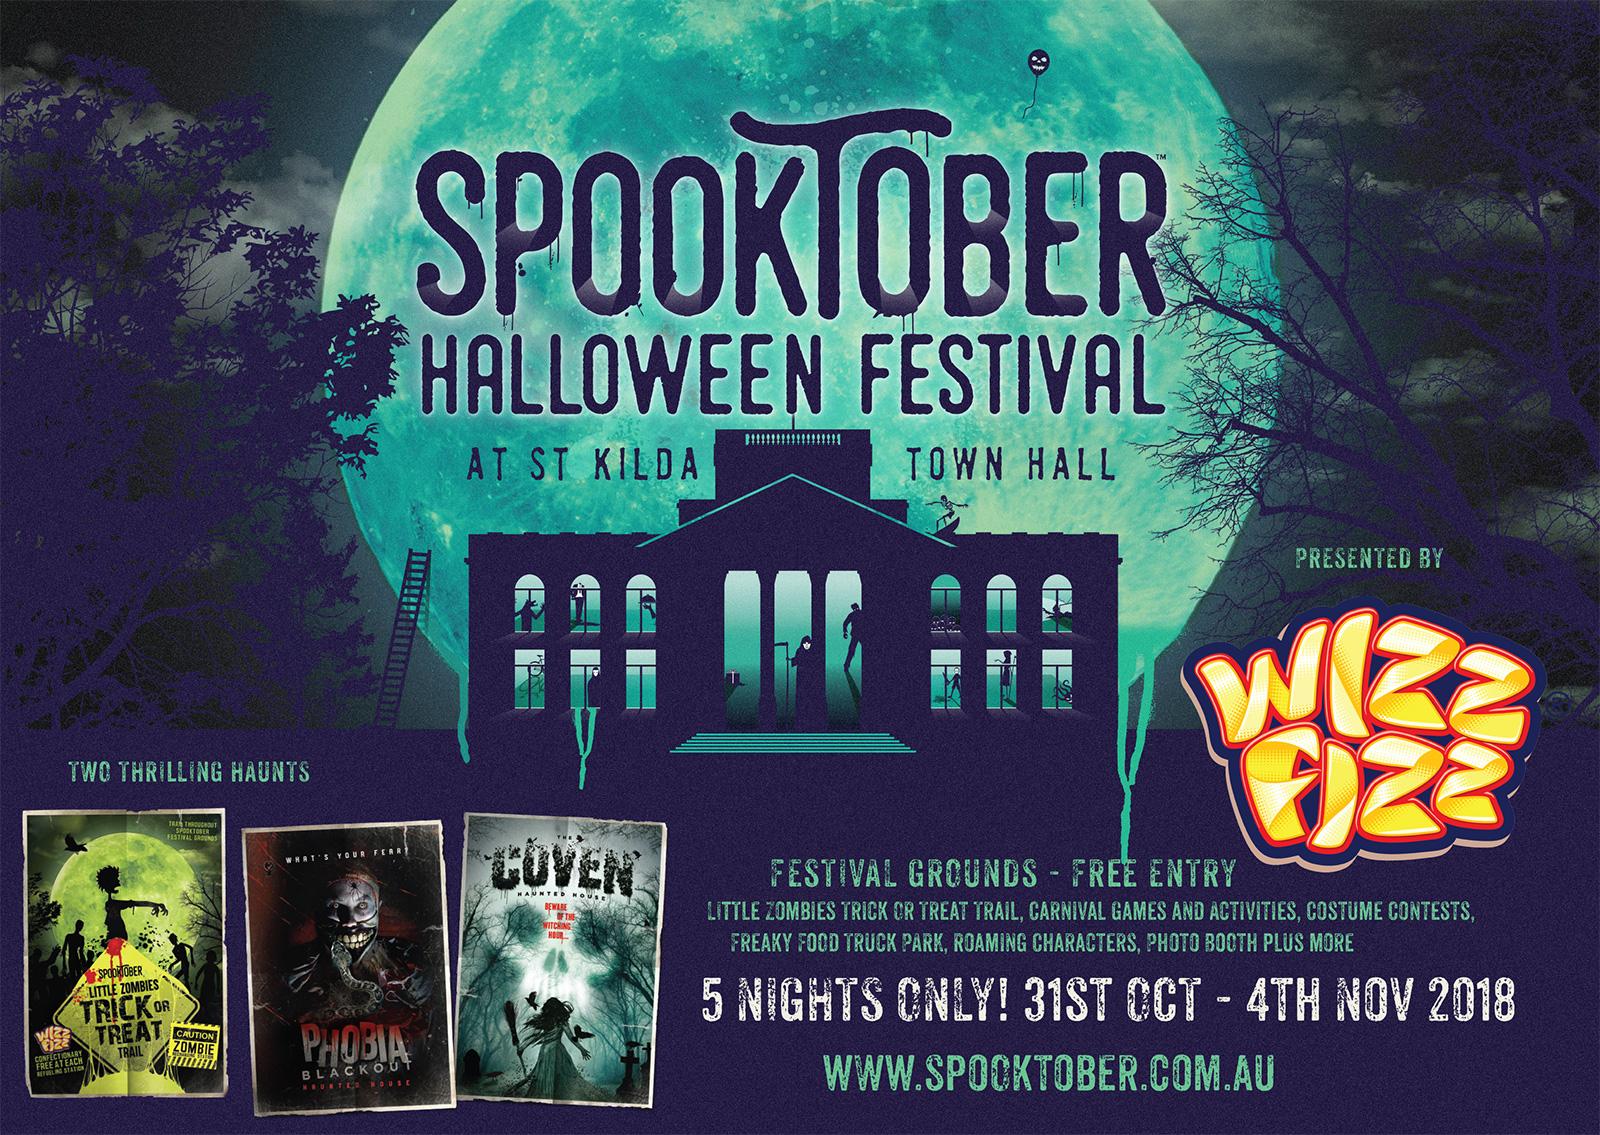 Spooktober Halloween Festival – St Kilda